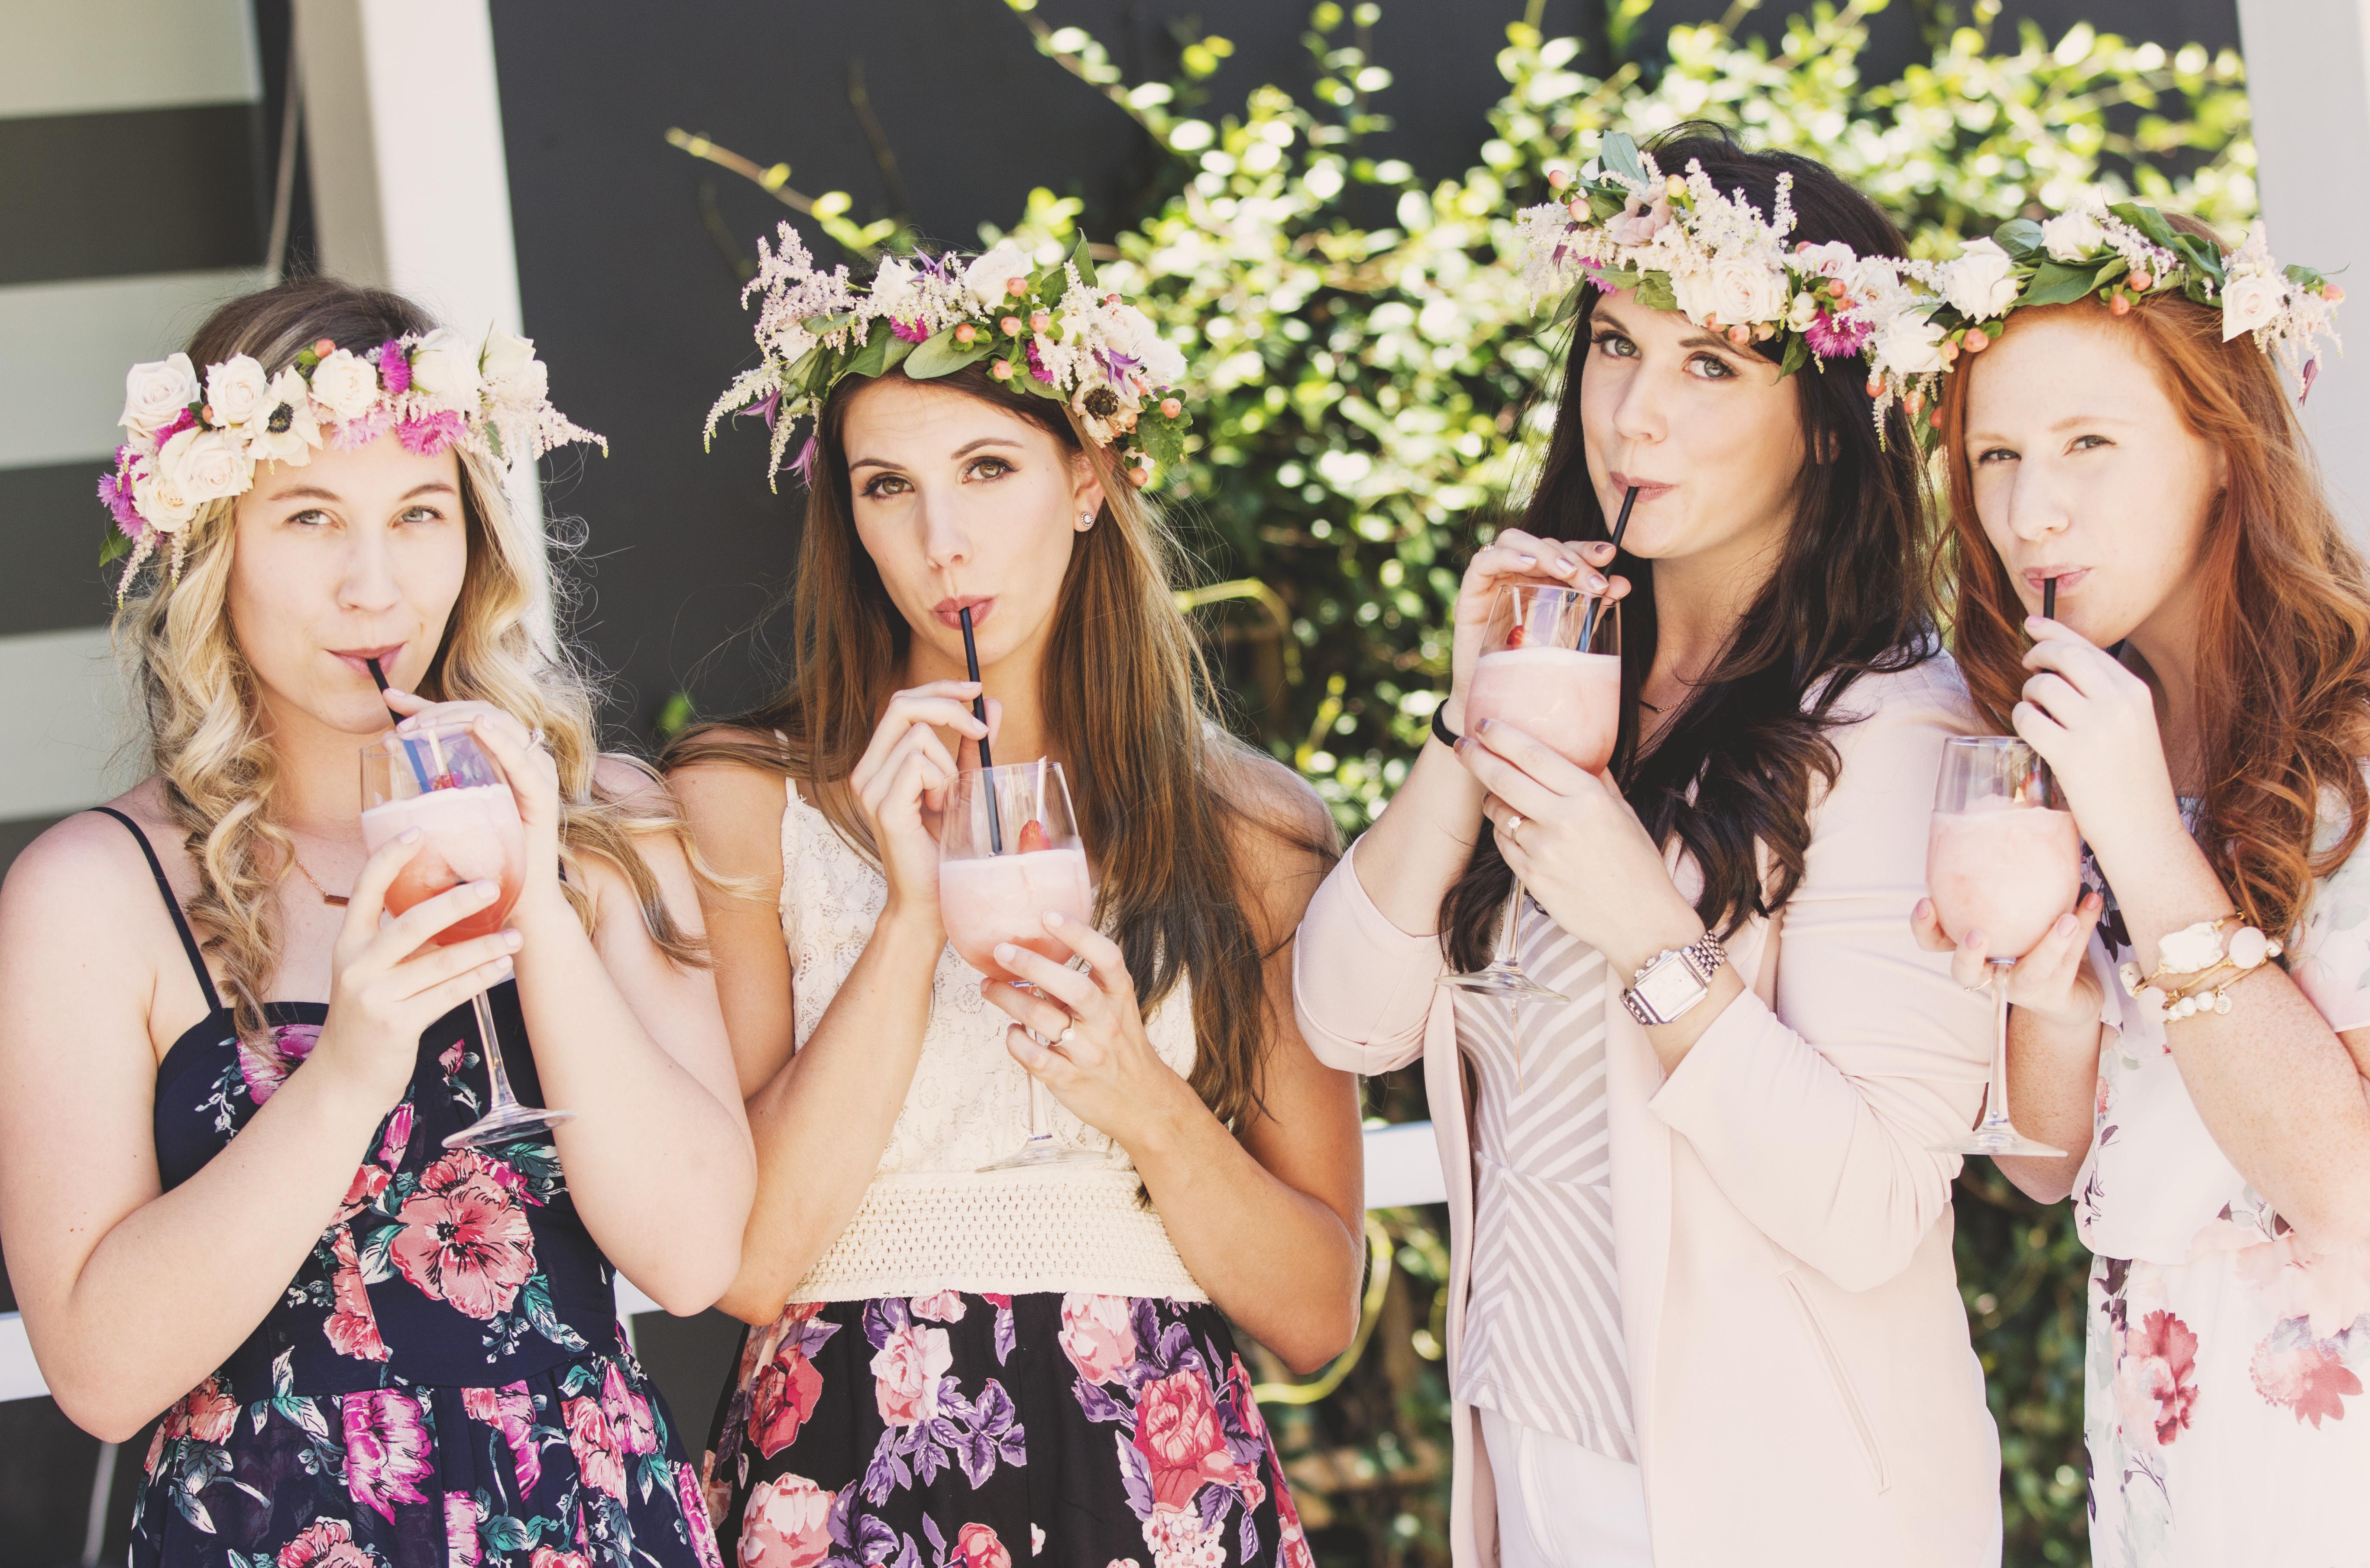 Flower Crown Bachelorette Party - TrueBlu  b3fd5866c1e